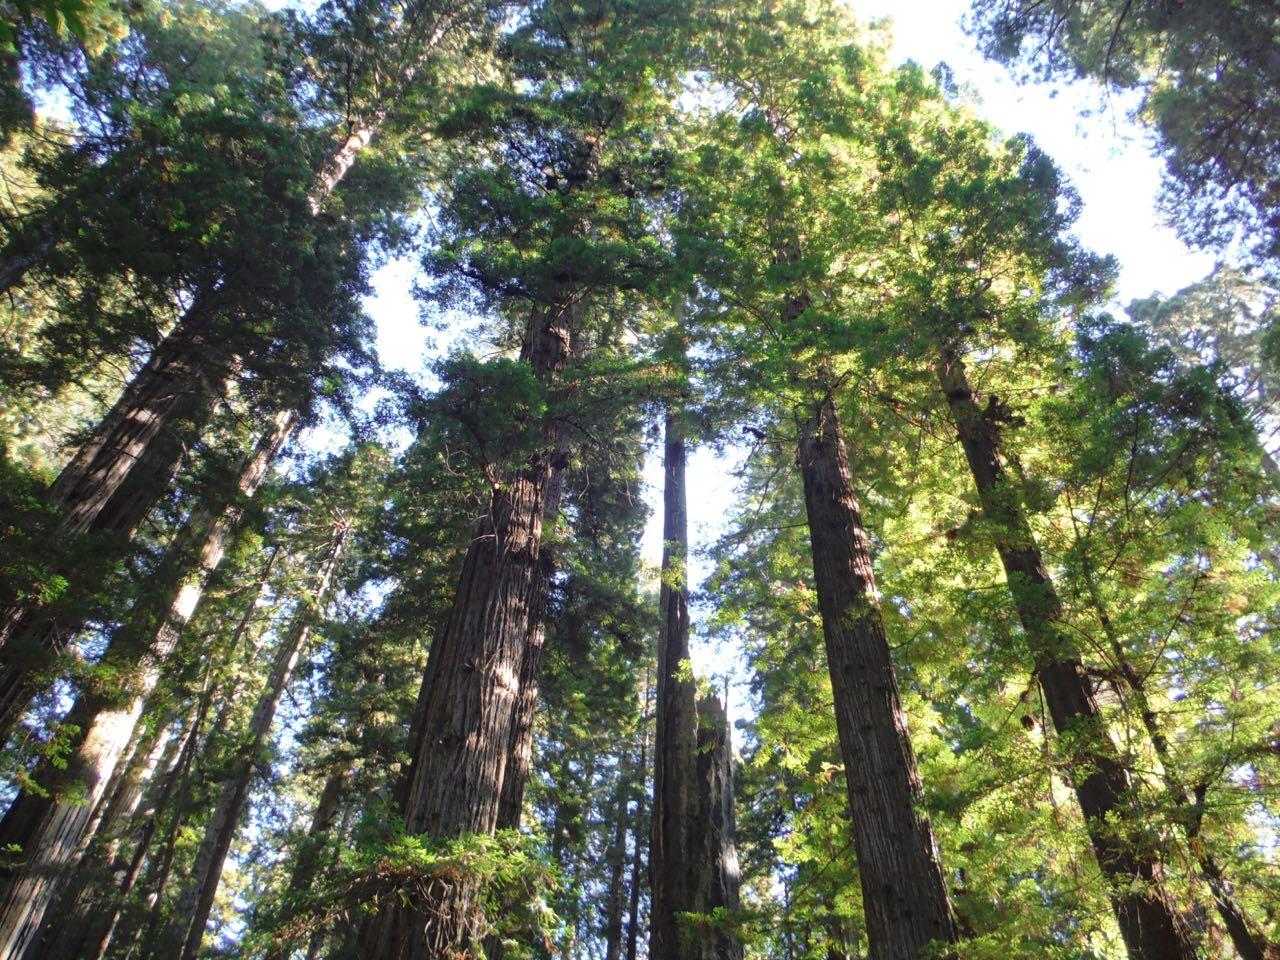 Redwoods 2017 10 08 241 Of 287